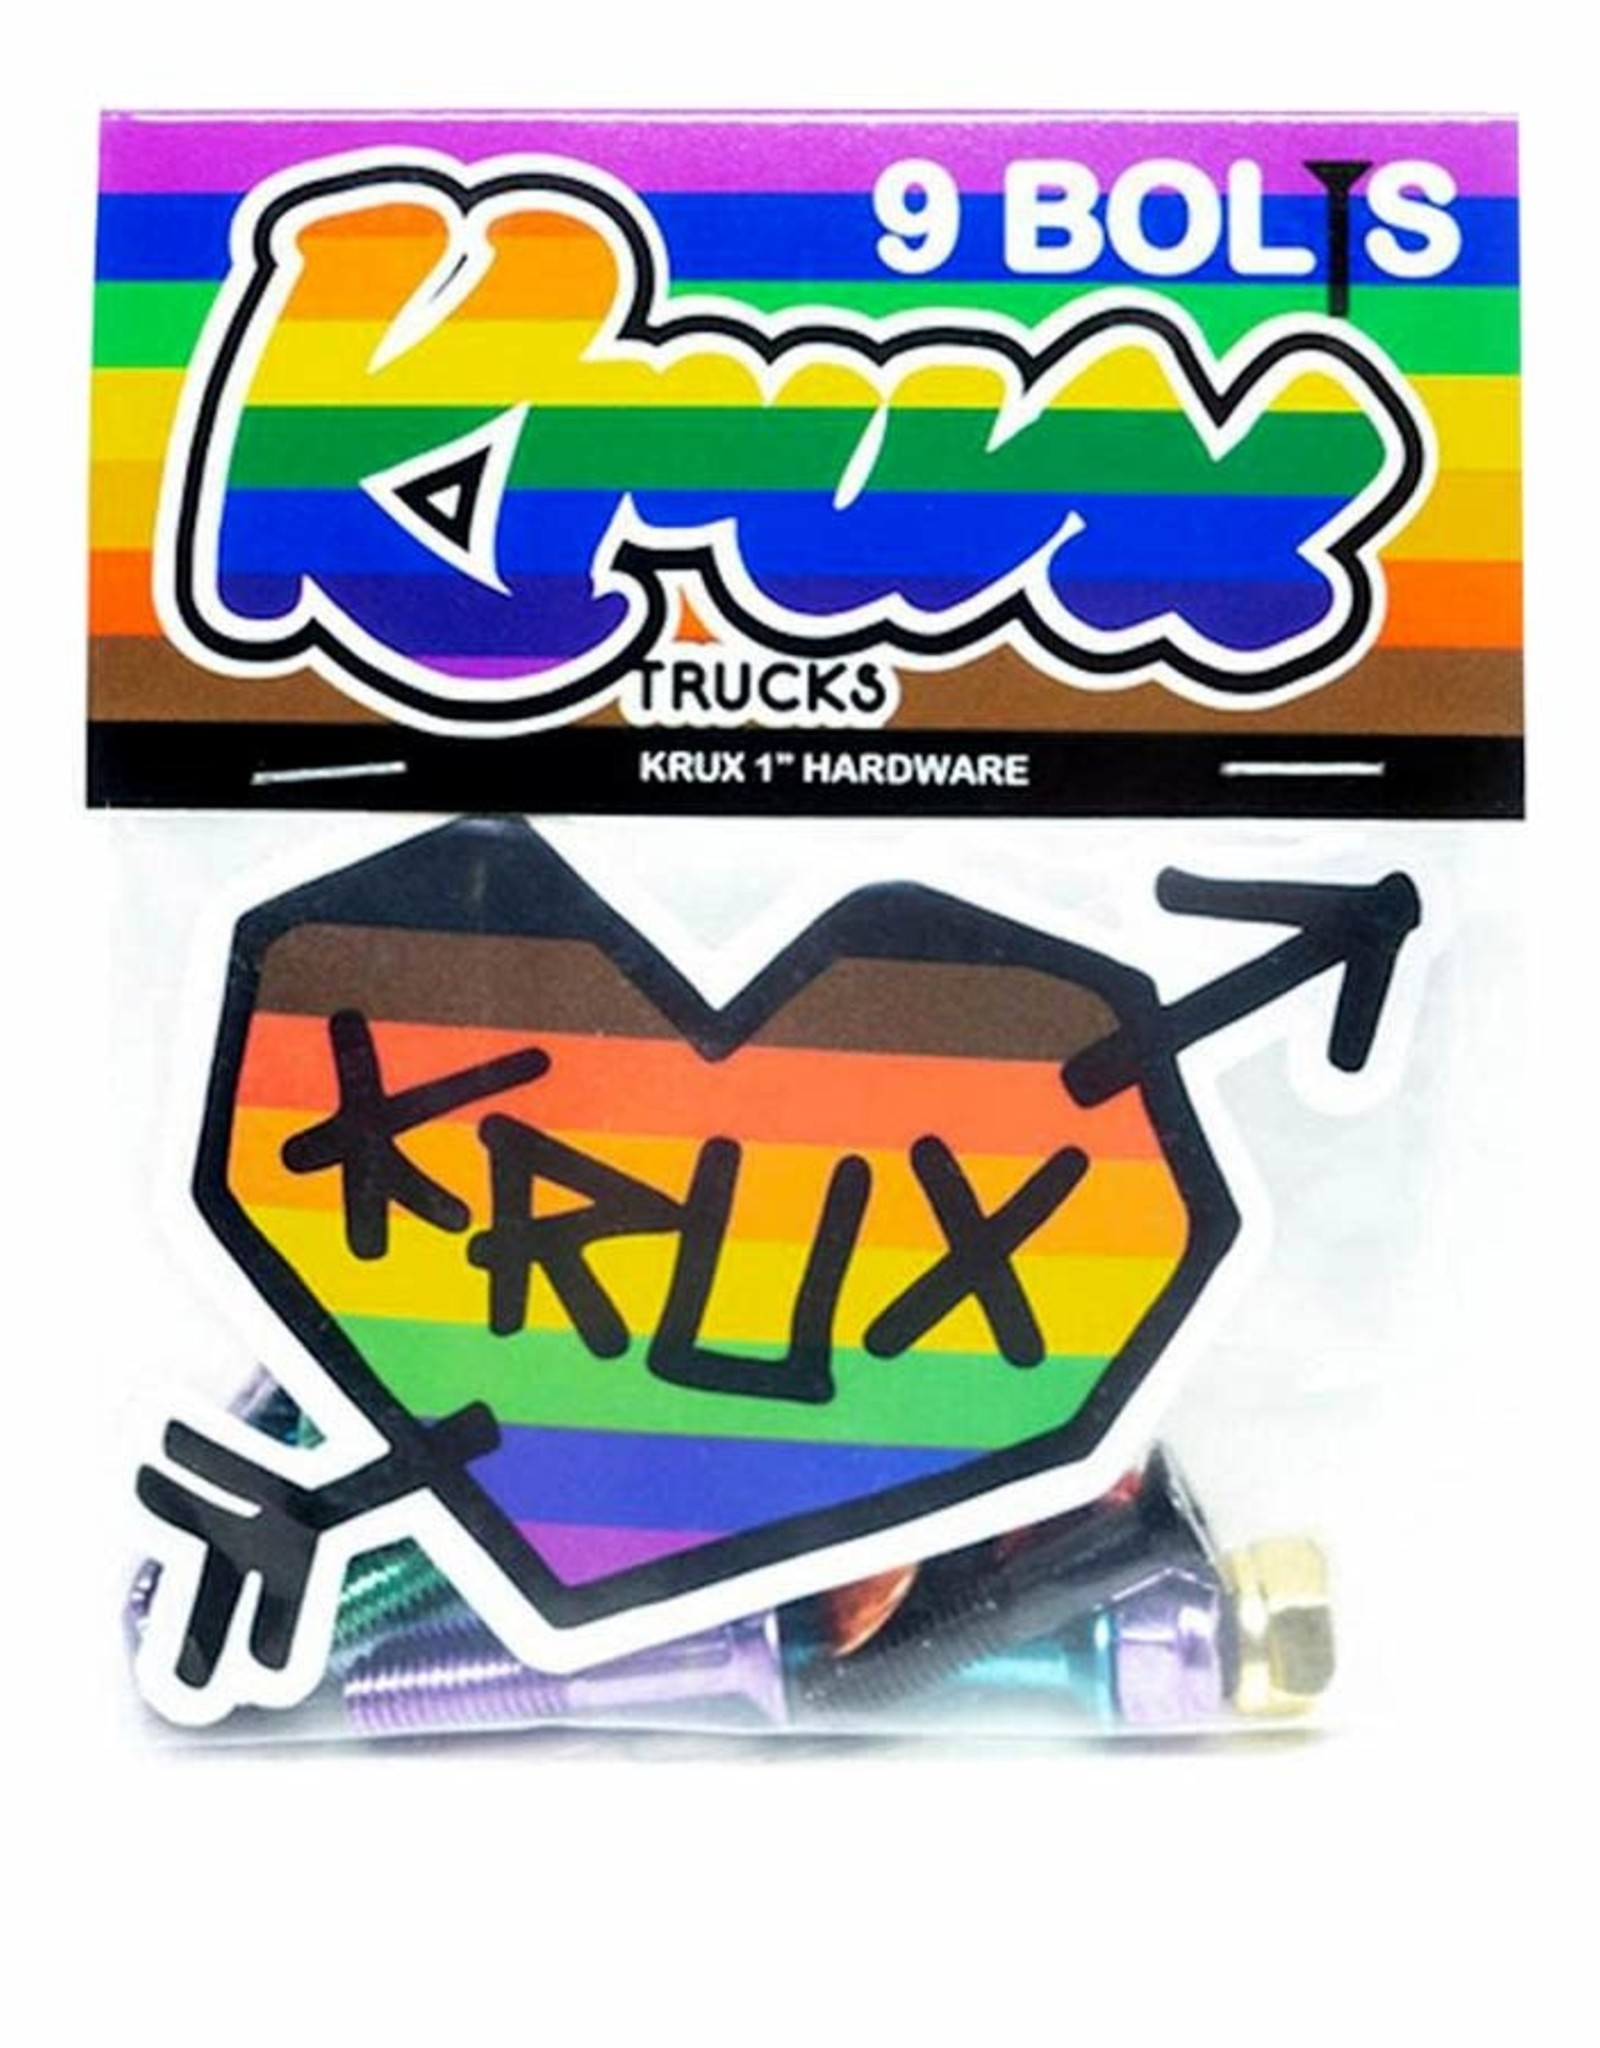 KRUX HARDWARE KROME PHILLIPS 1IN RAINBOW